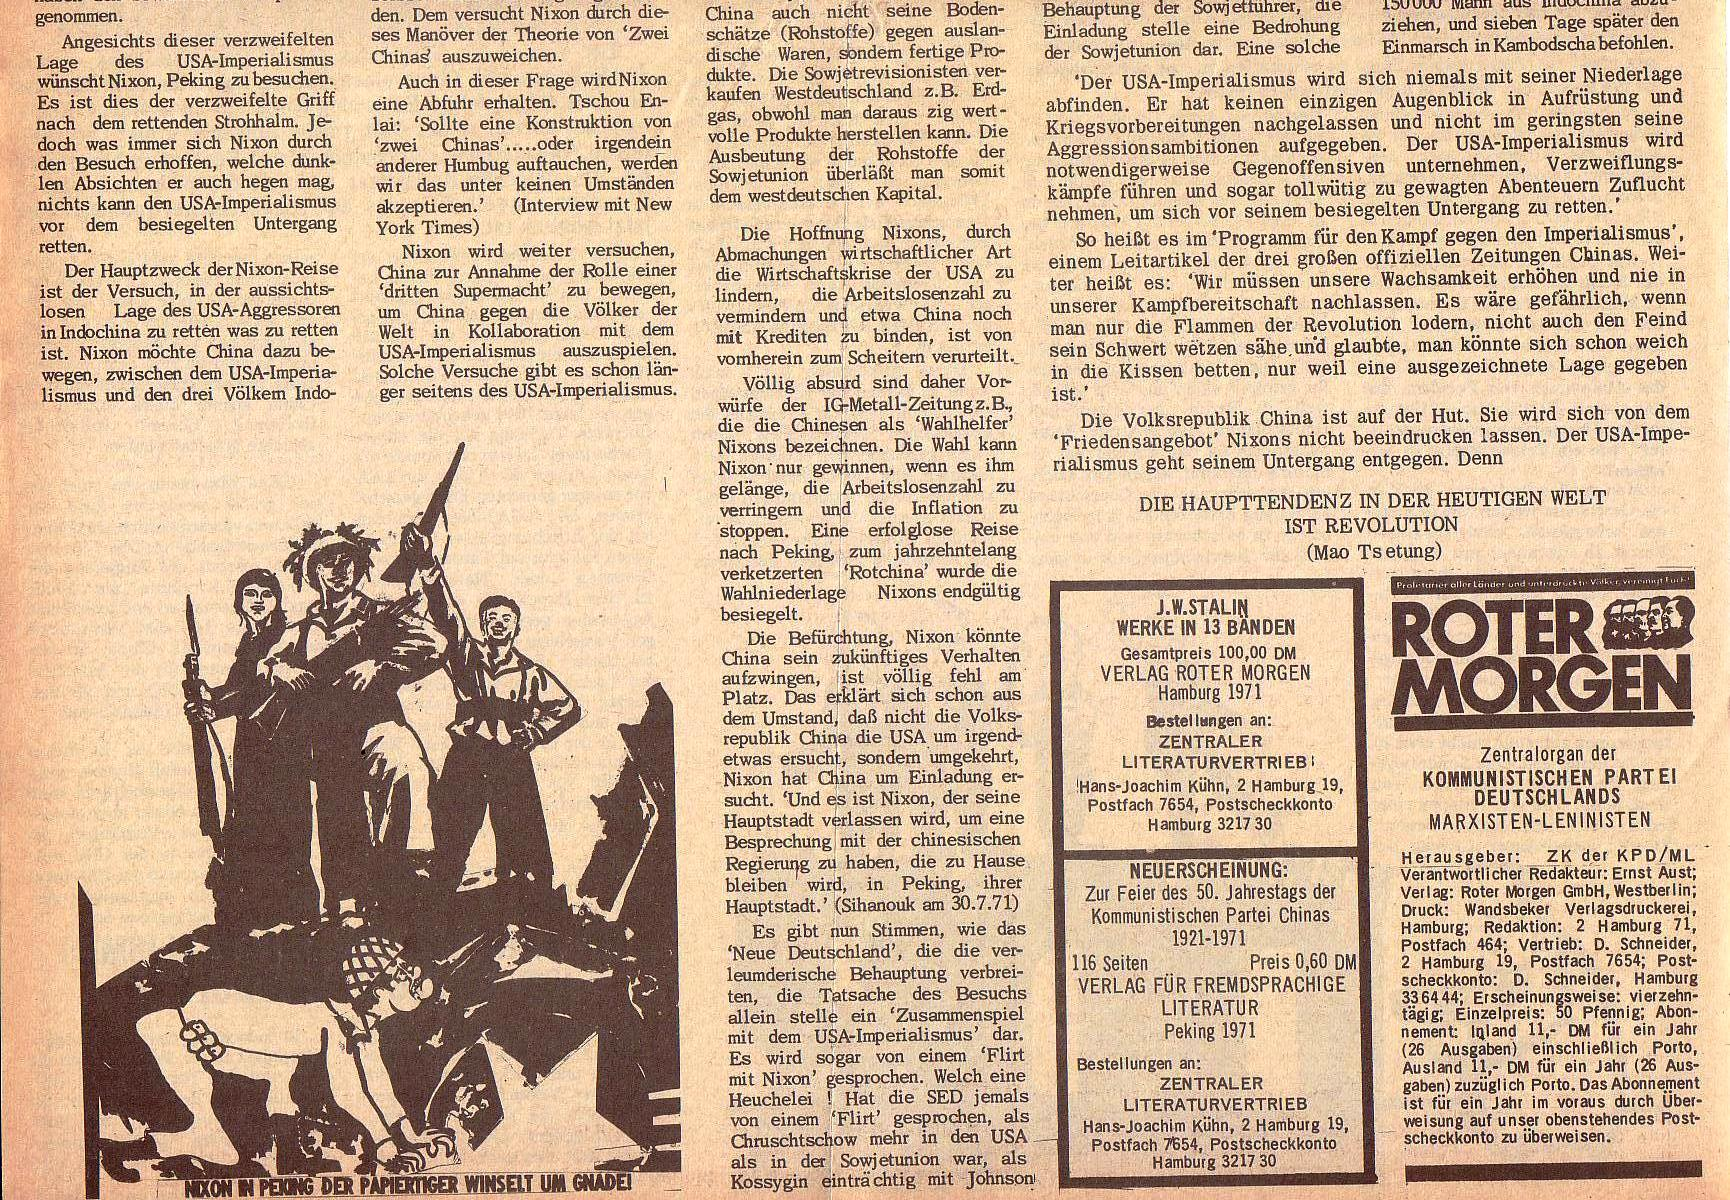 Roter Morgen, 5. Jg., 13. September 1971, Nr. 9, Seite 2b